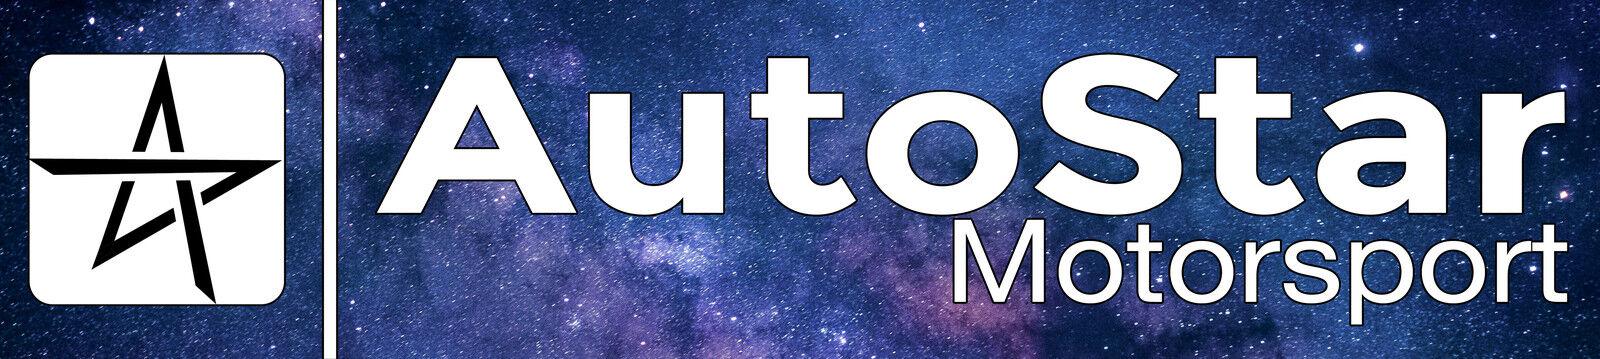 AutoStar Motorsport (Toddsales13)